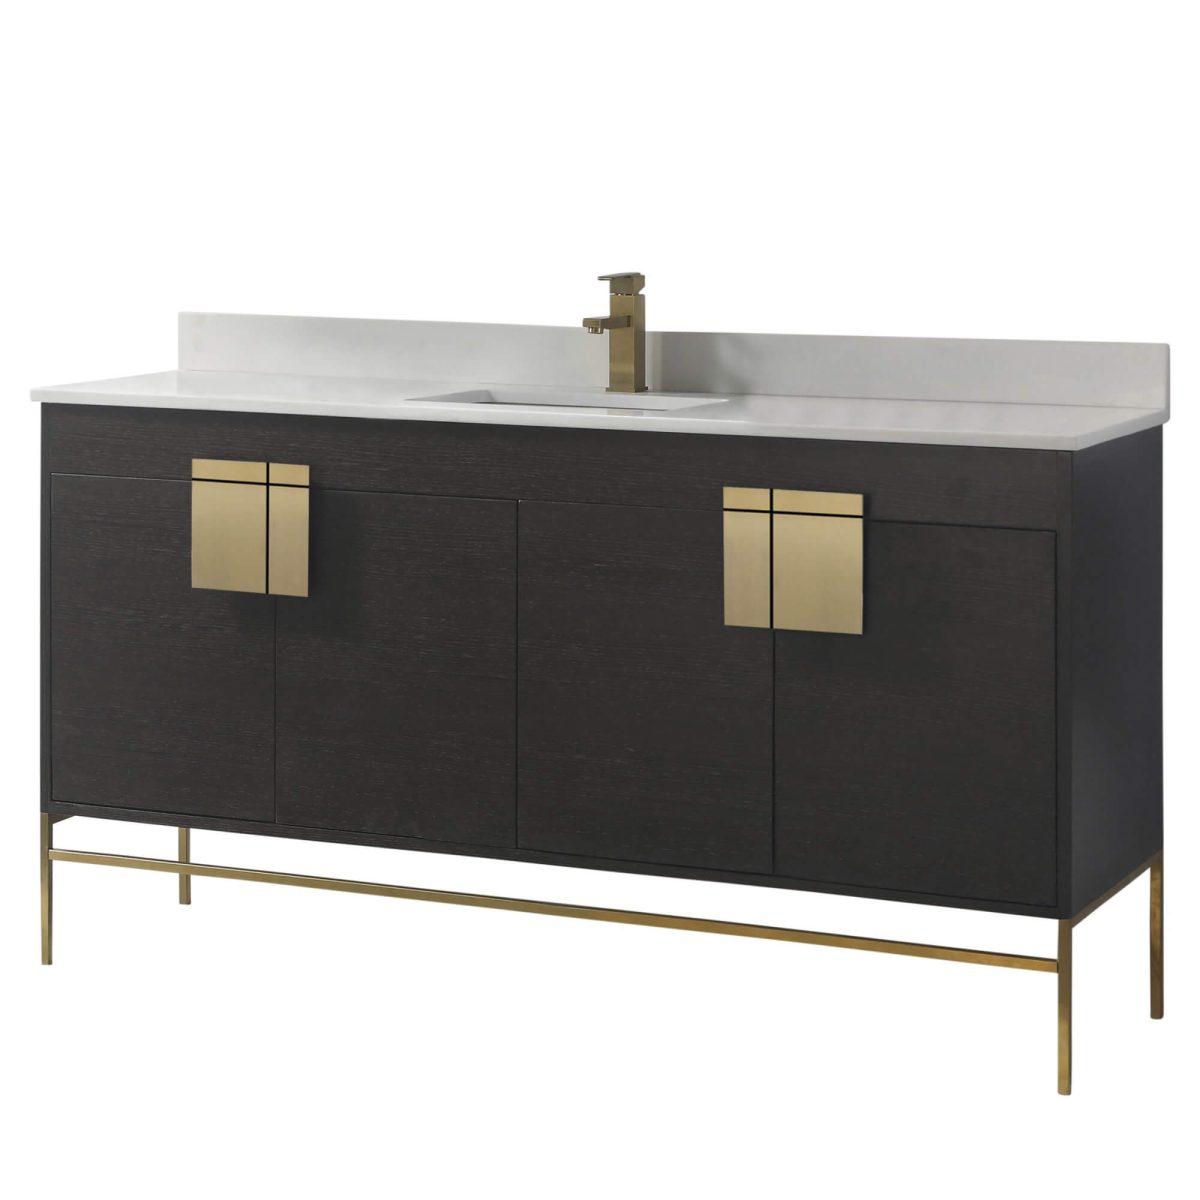 "Shawbridge 60"" Modern Single Bathroom Vanity  Black Oak Straight Grain with Satin Brass Hardware"